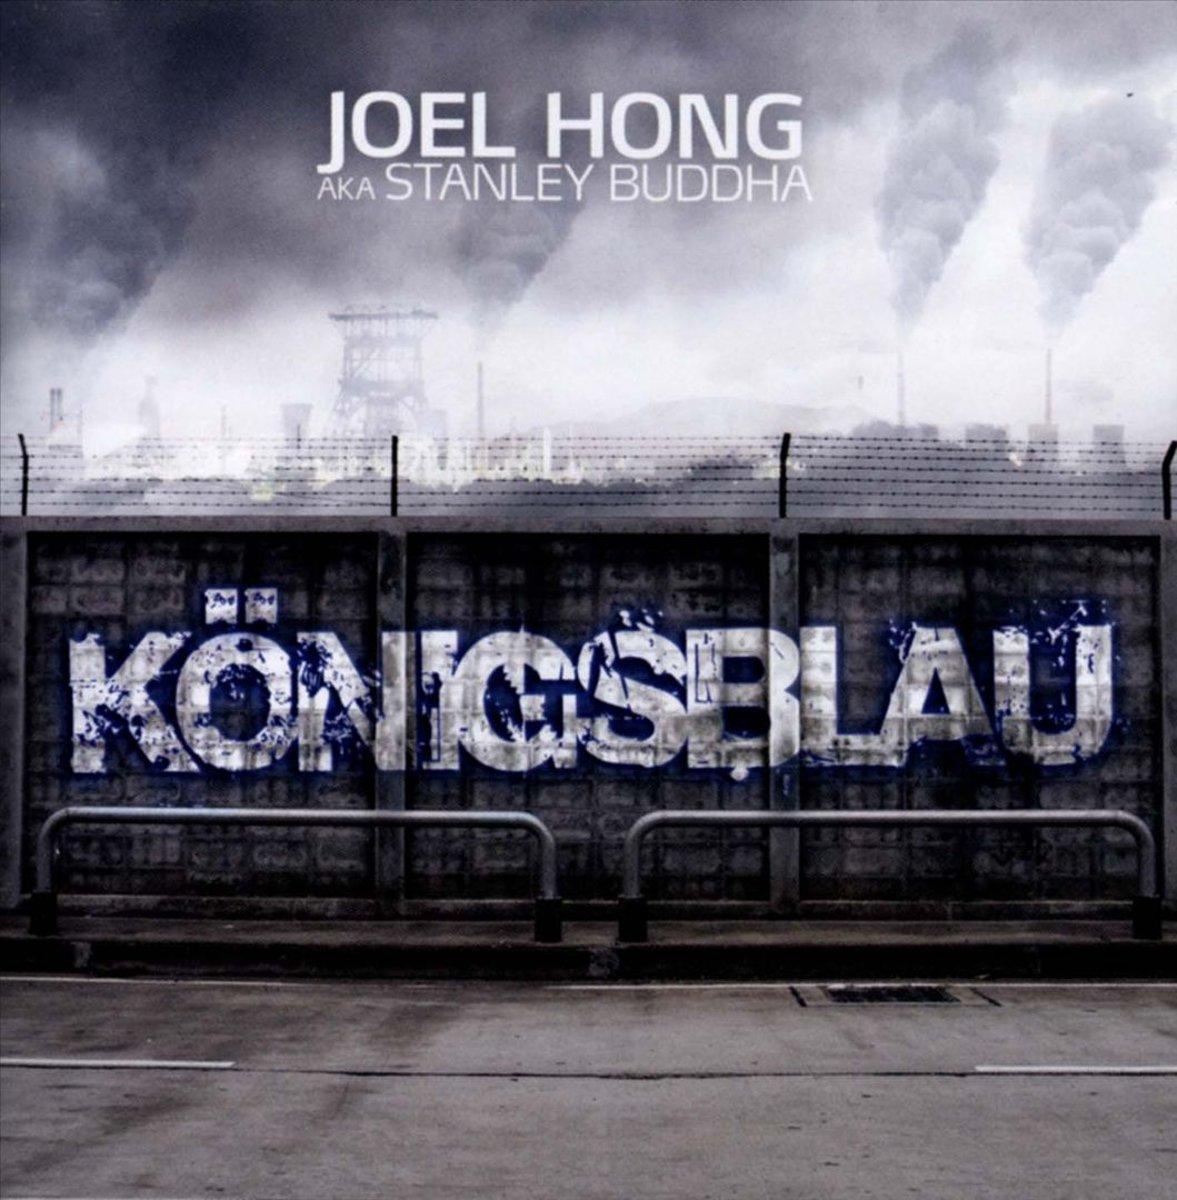 Joel Hong,Aka Stanley Buddha Joel Hong, Aka Stanley Buddha. Konigsblau цена и фото